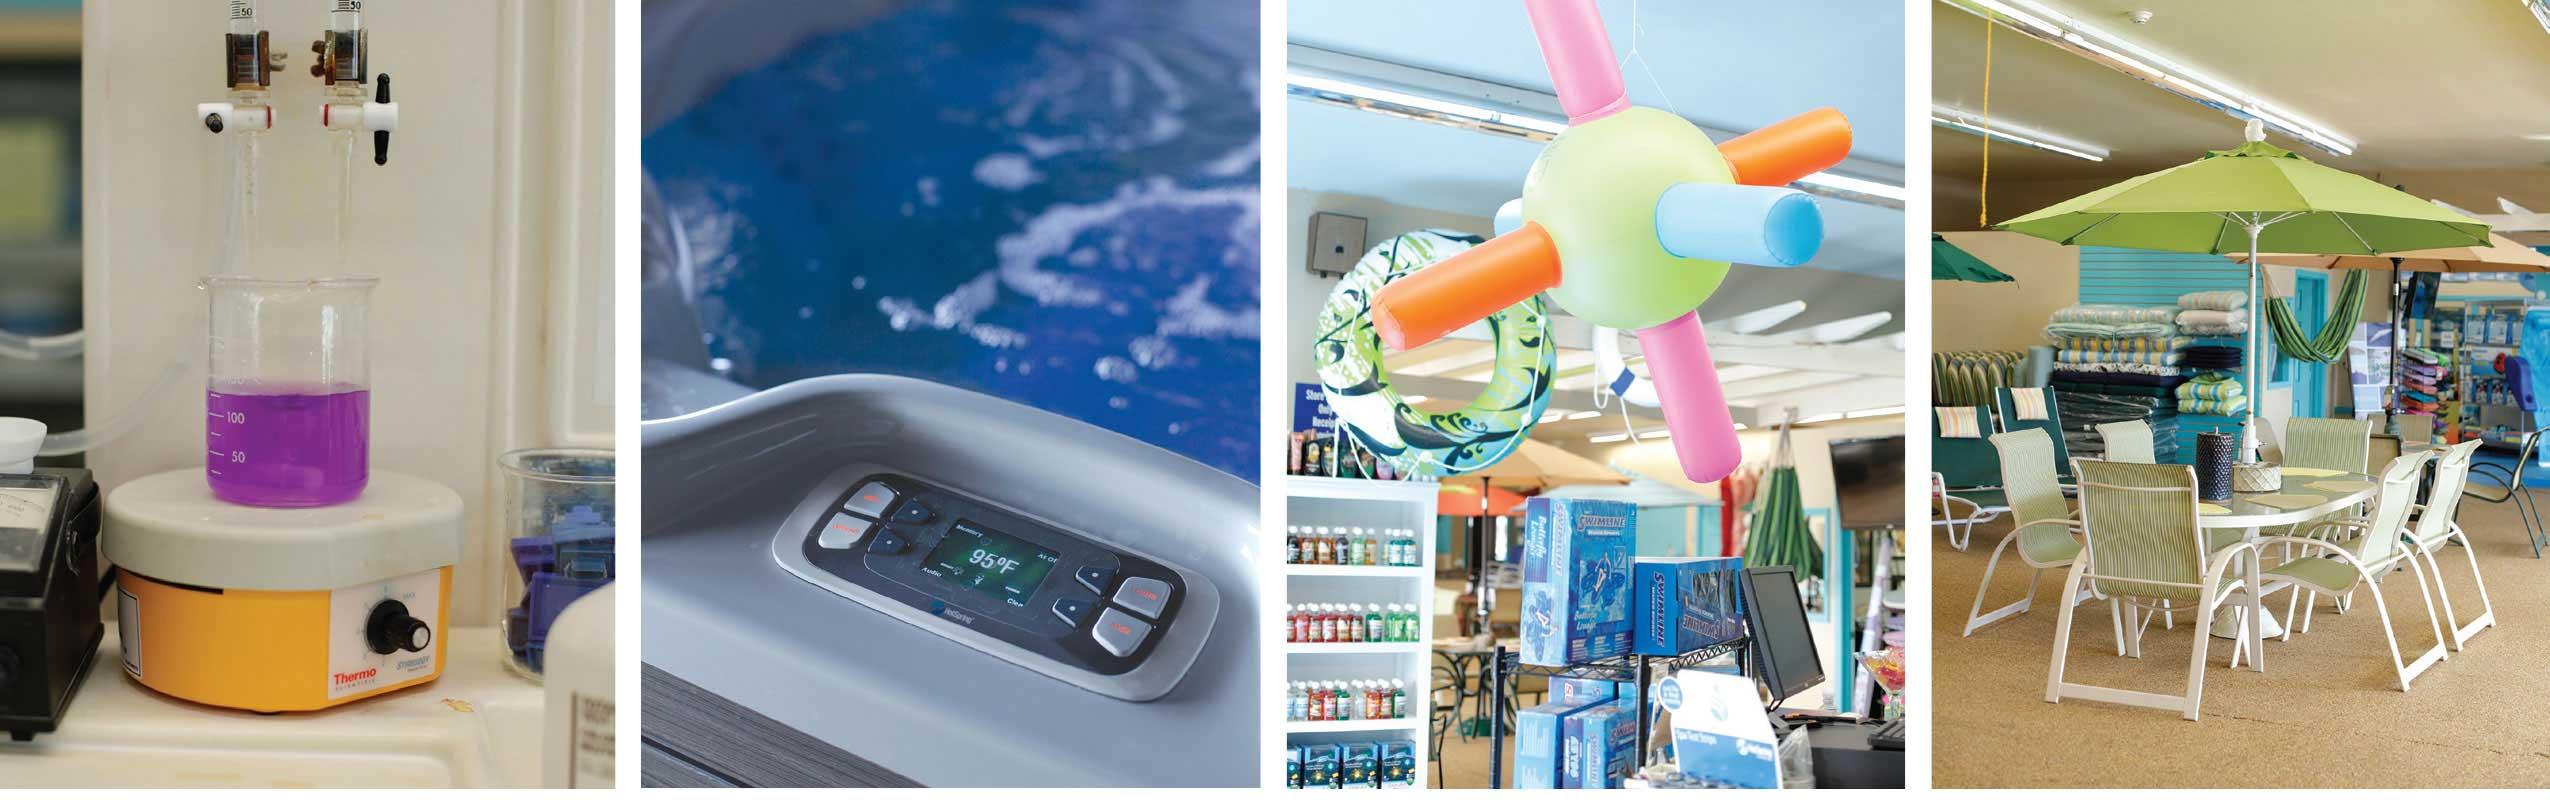 Summer 2016 Aqua Jet Pools Spas And Patio Furniture